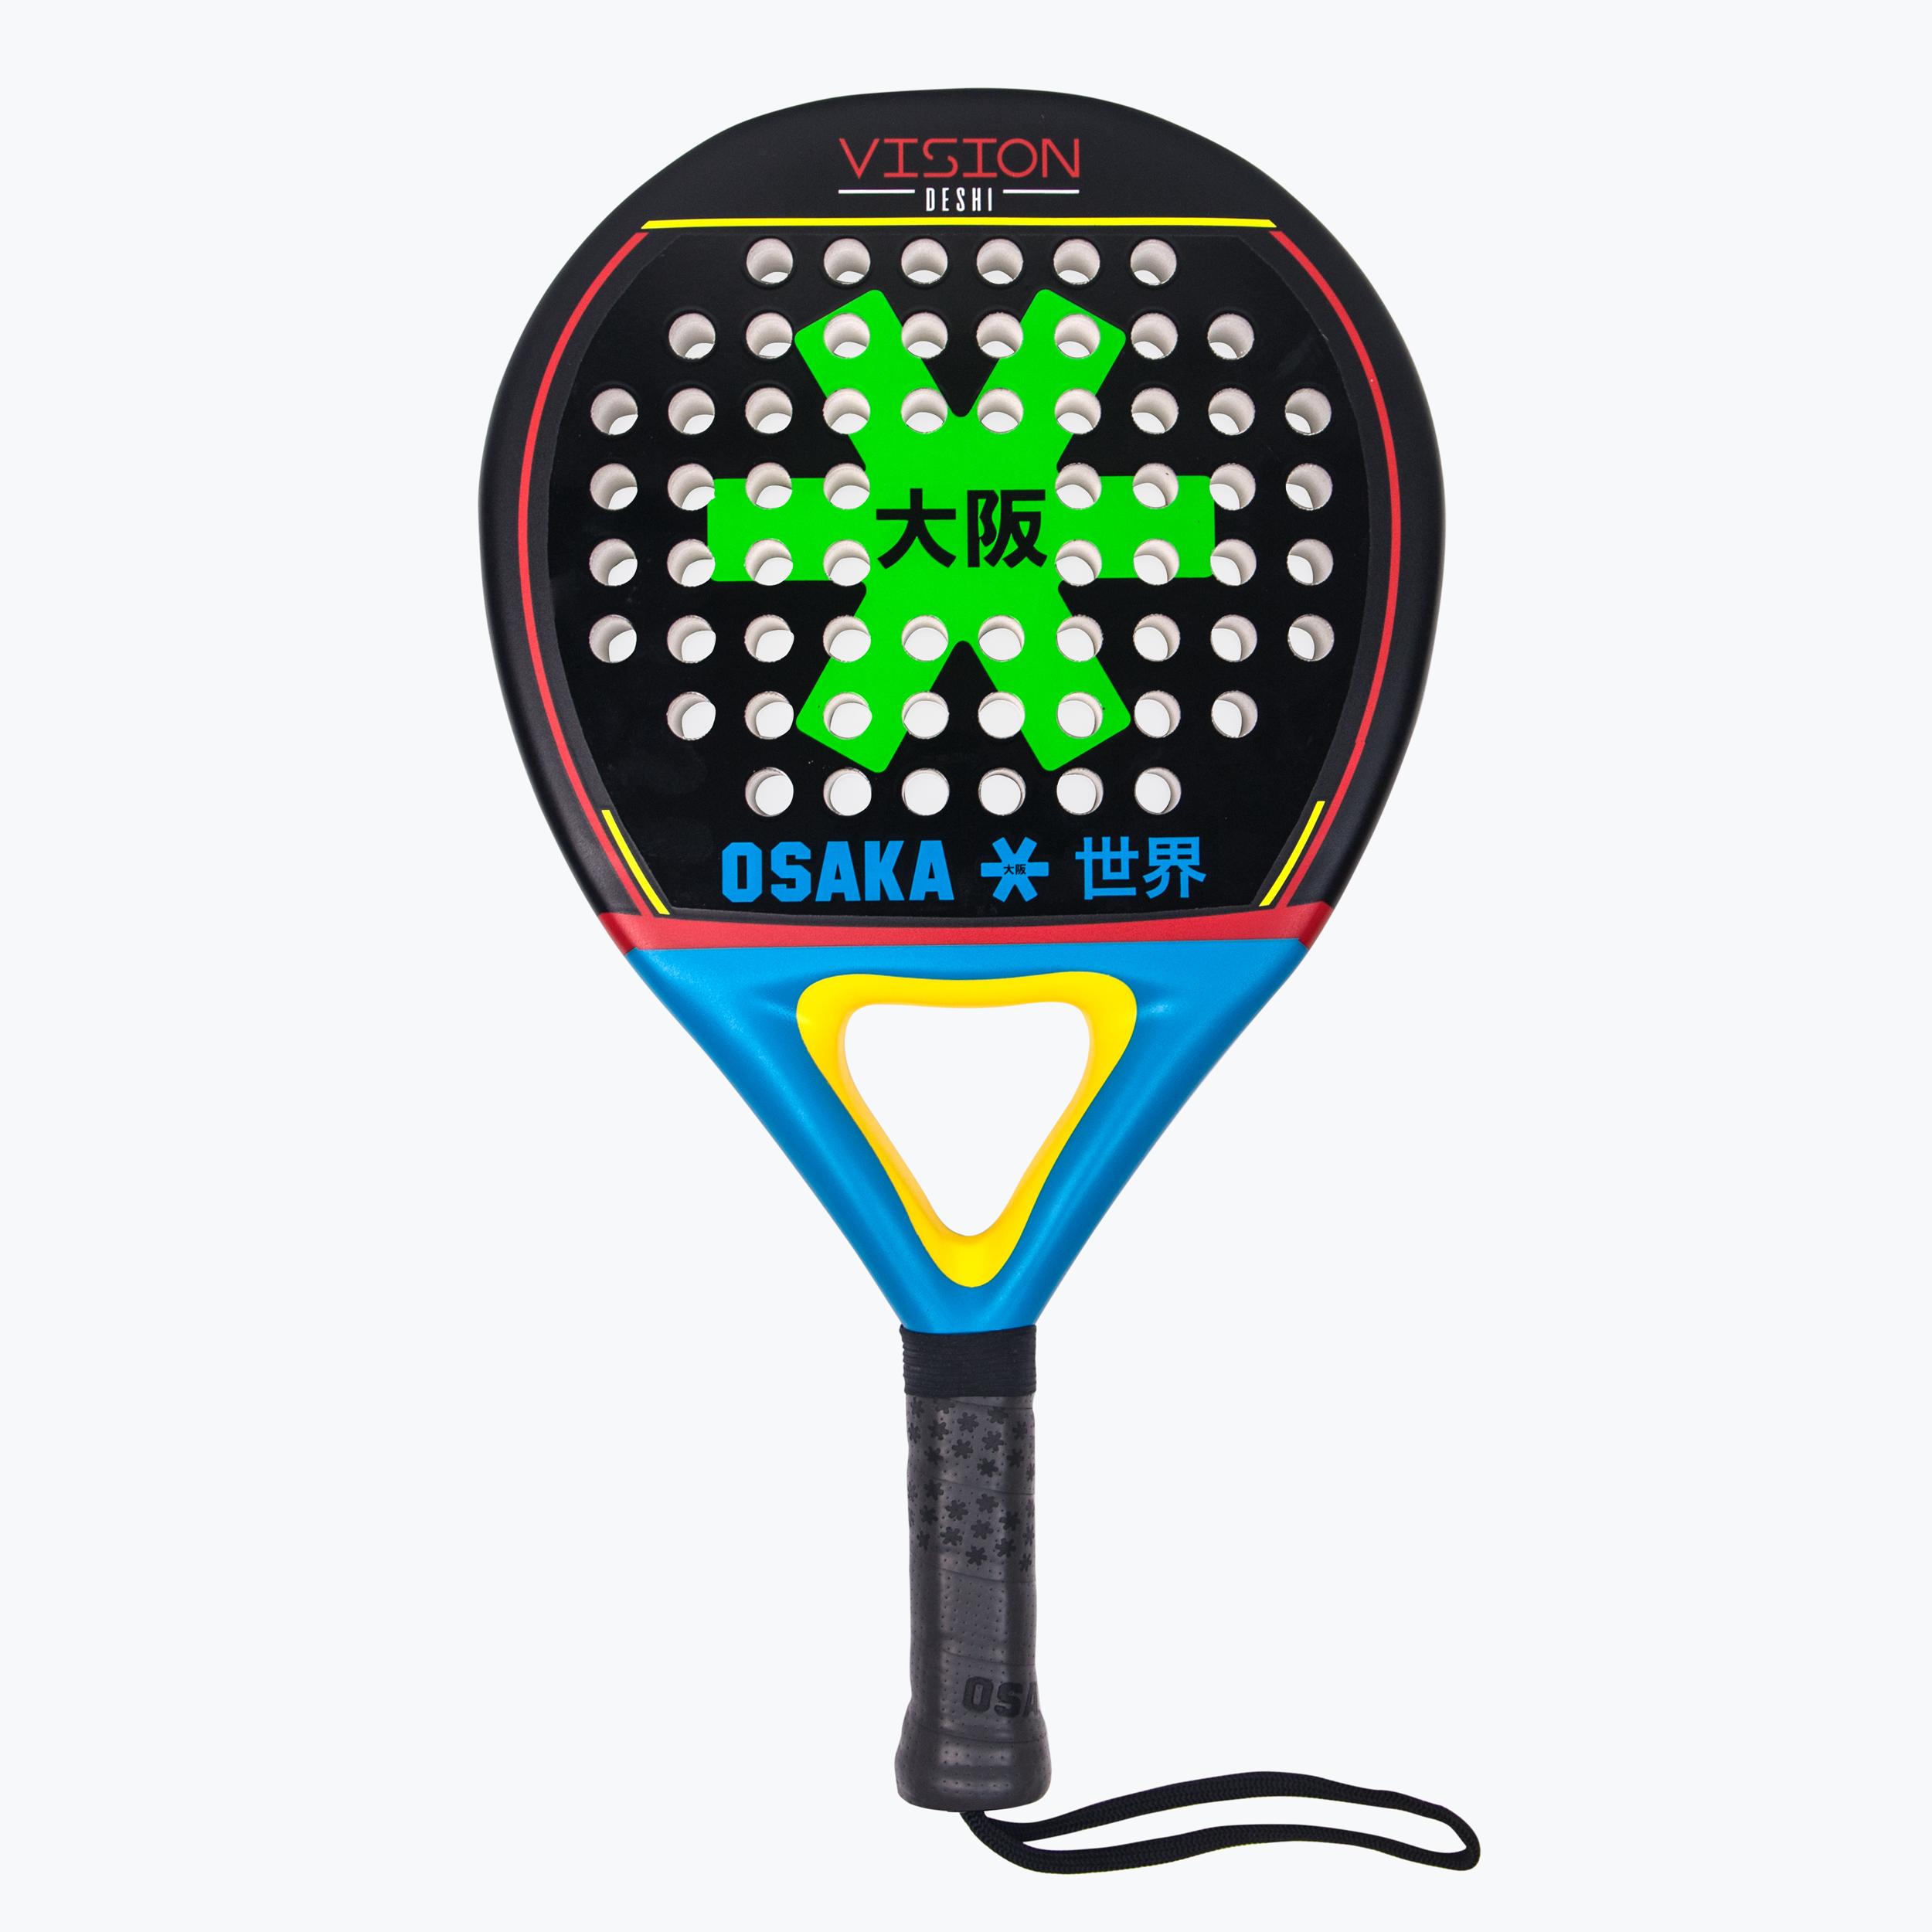 OSAKA - Deshi Padel Tennis